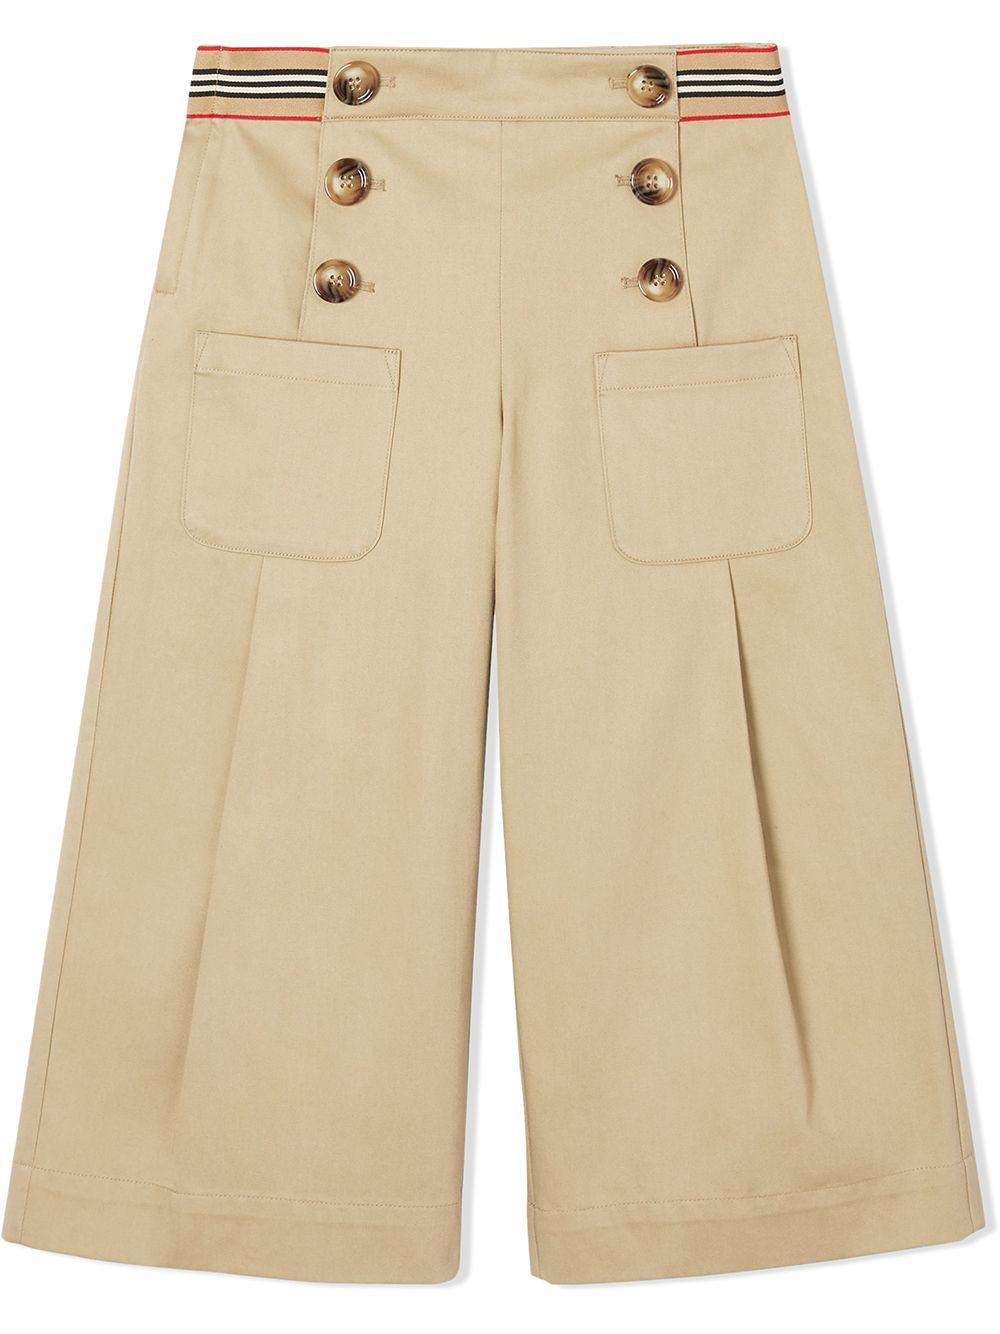 PANTALONE BEIGE BURBERRY KIDS | Pantalone | 8030320A1366#